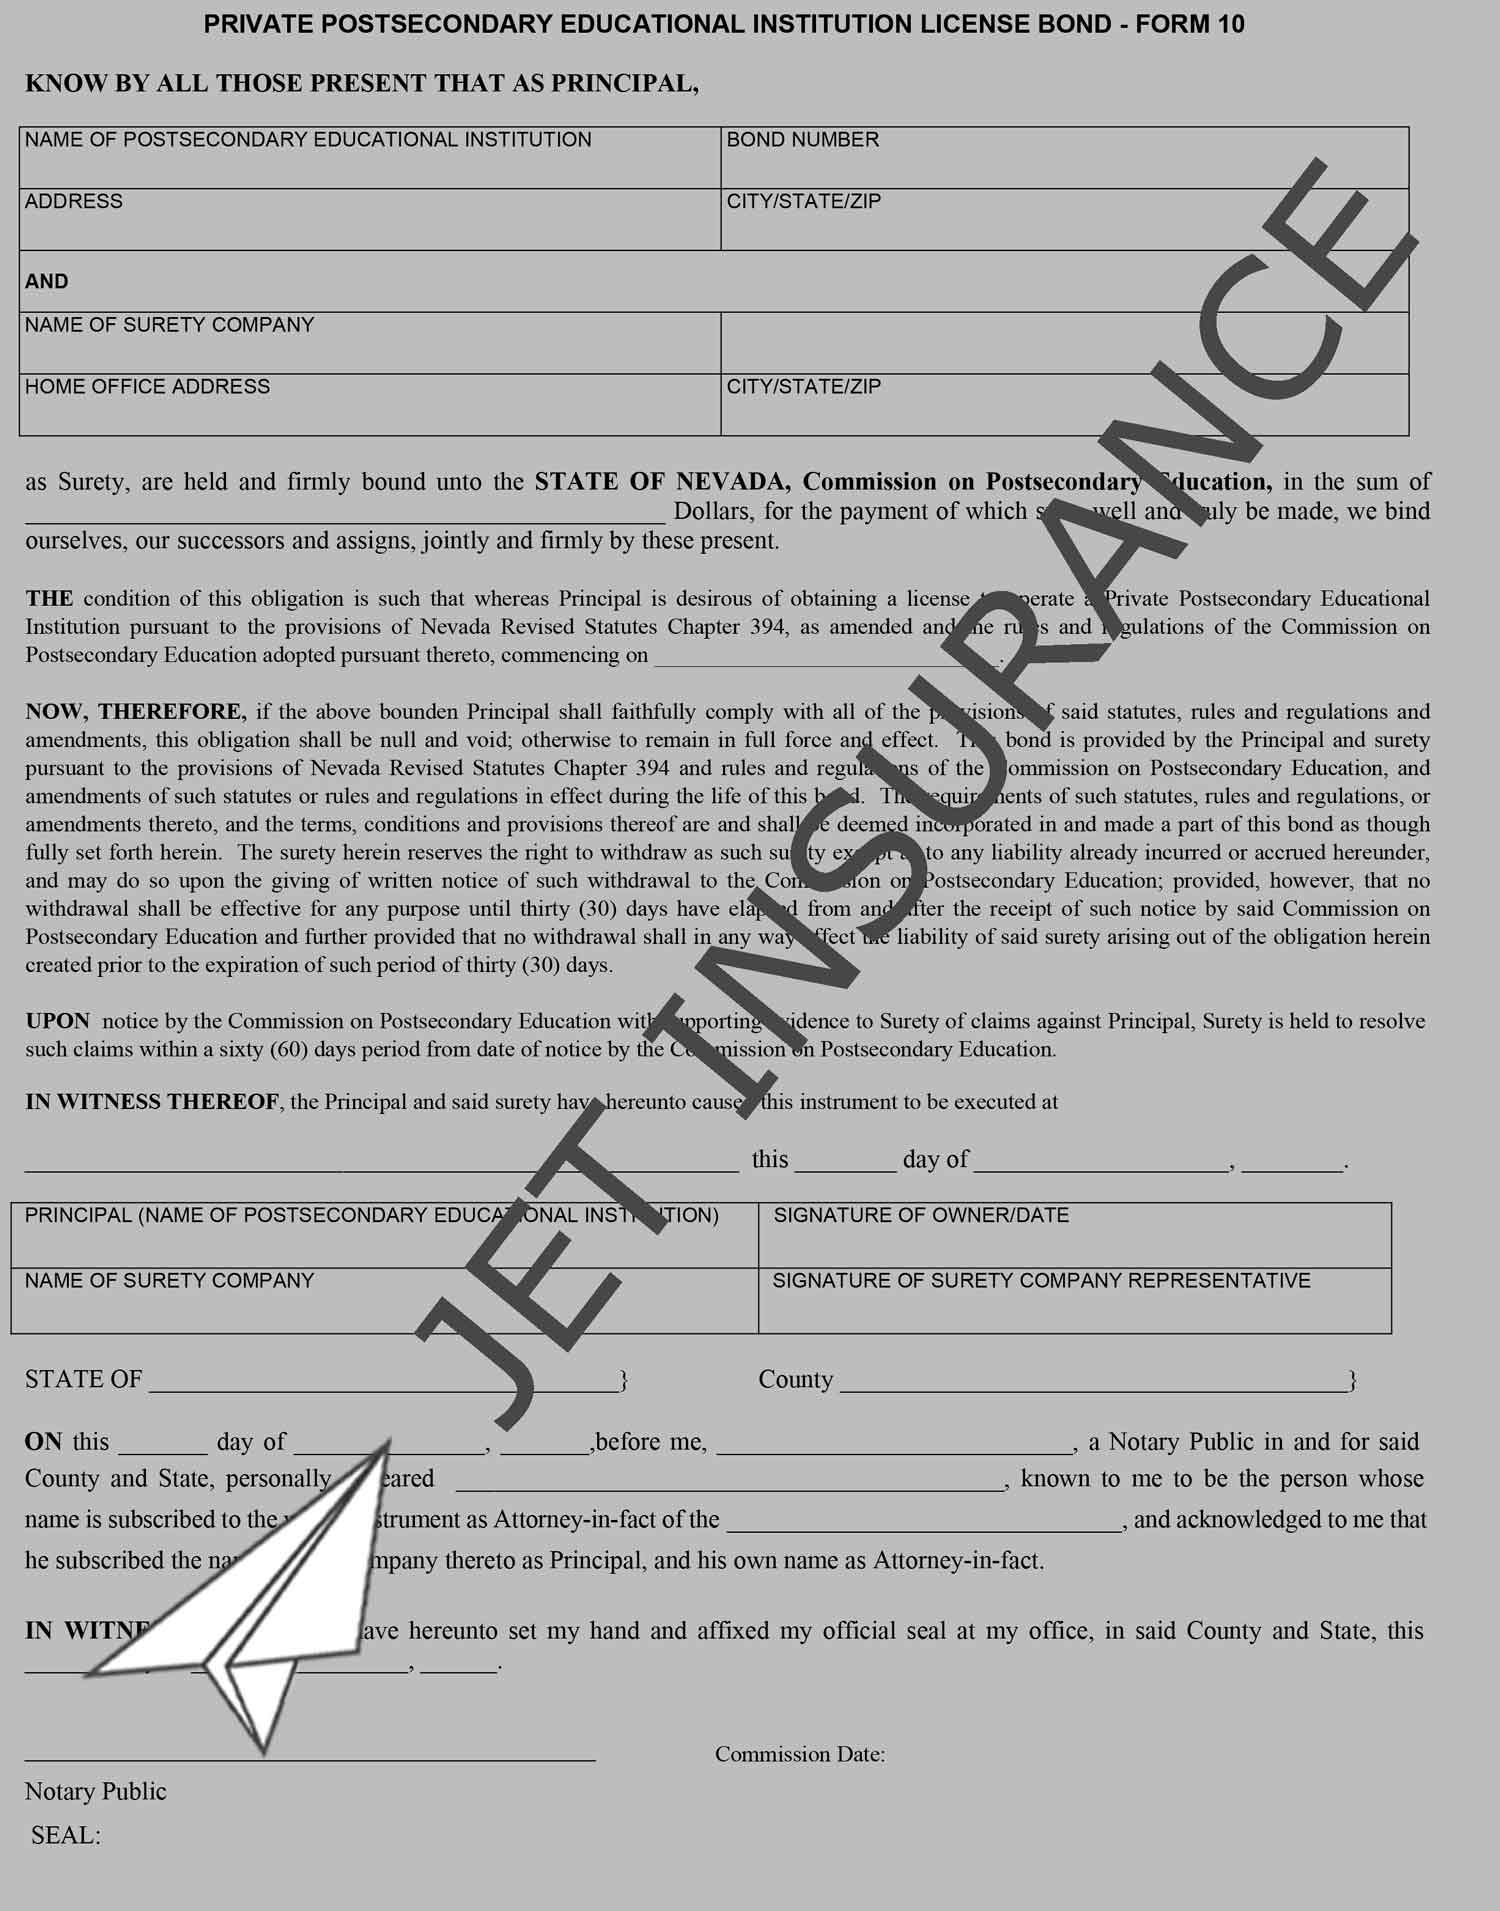 Nevada Private Postsecondary School Bond Form